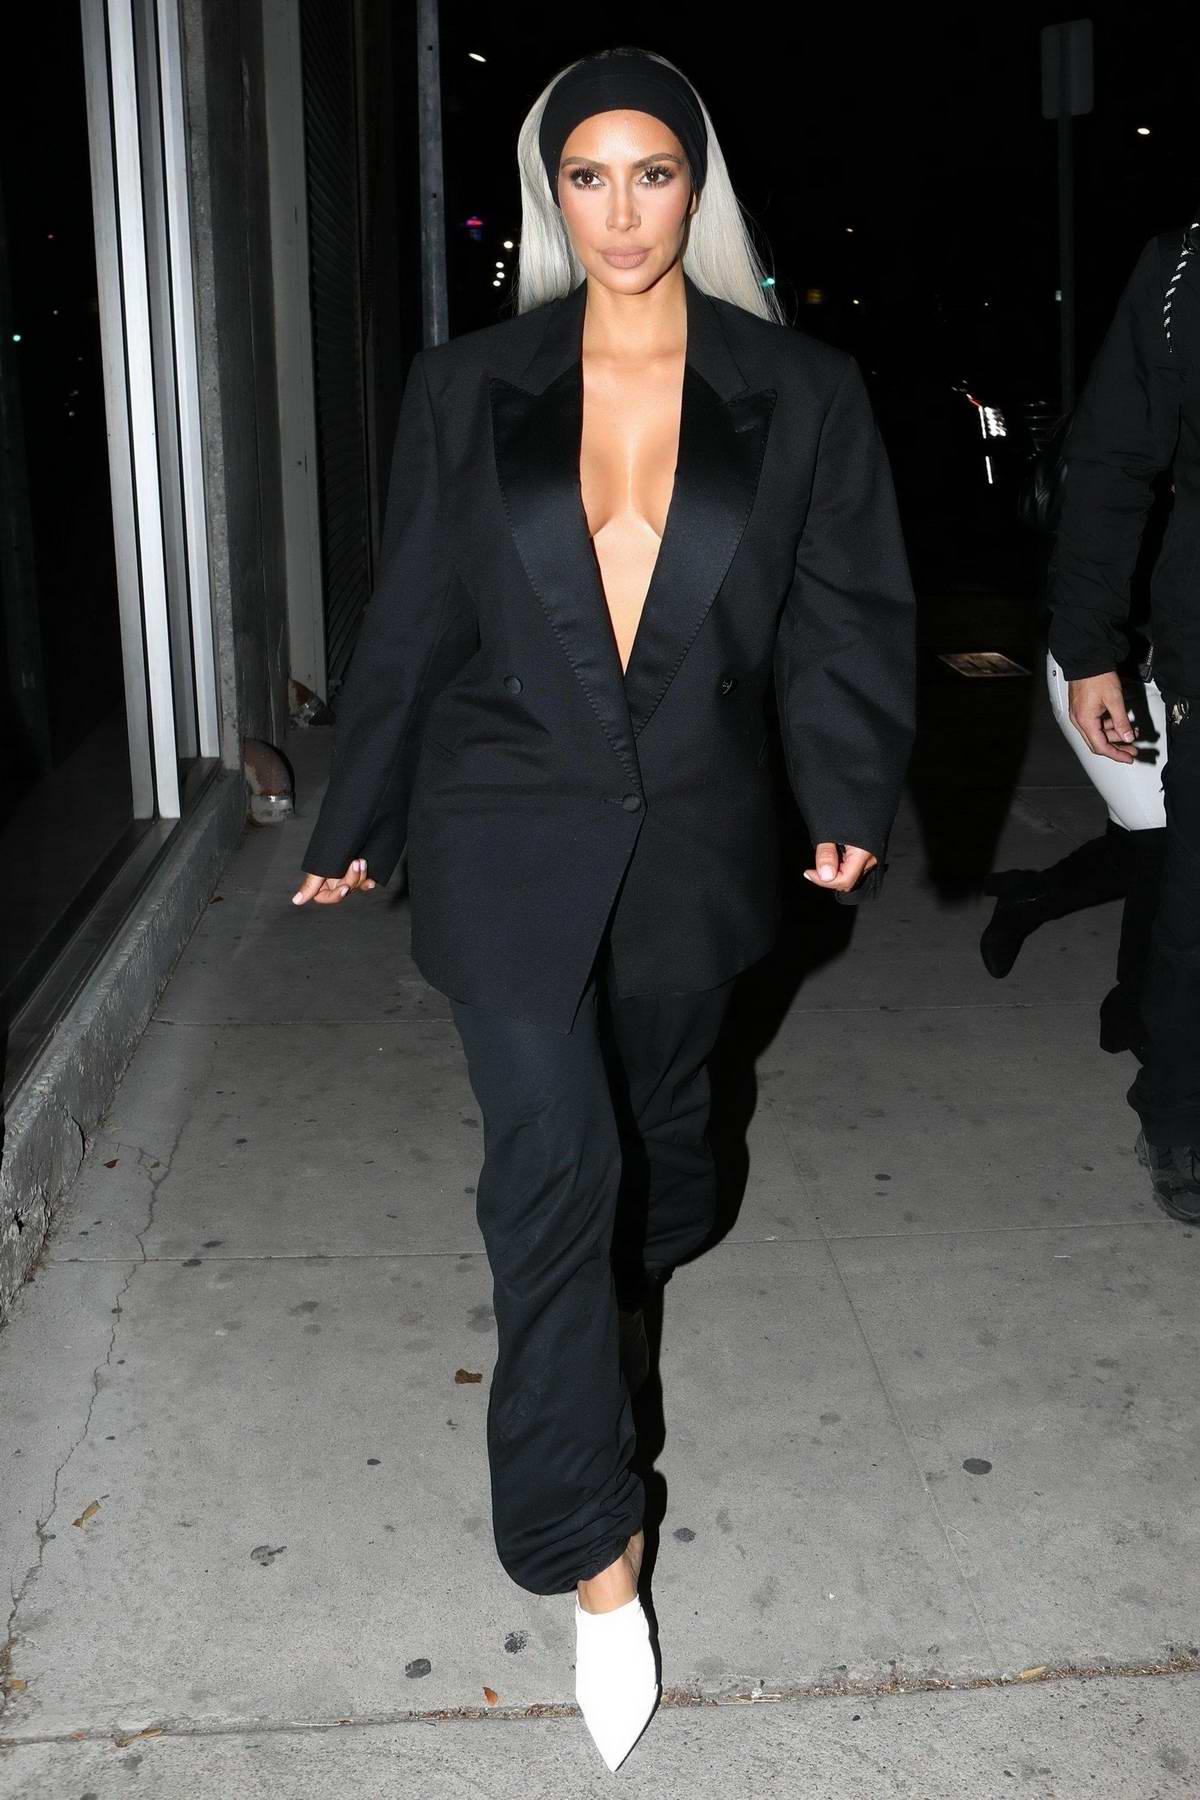 Kim Kardashian leaves the Create & Cultivate LA Conference in Downton Los Angeles